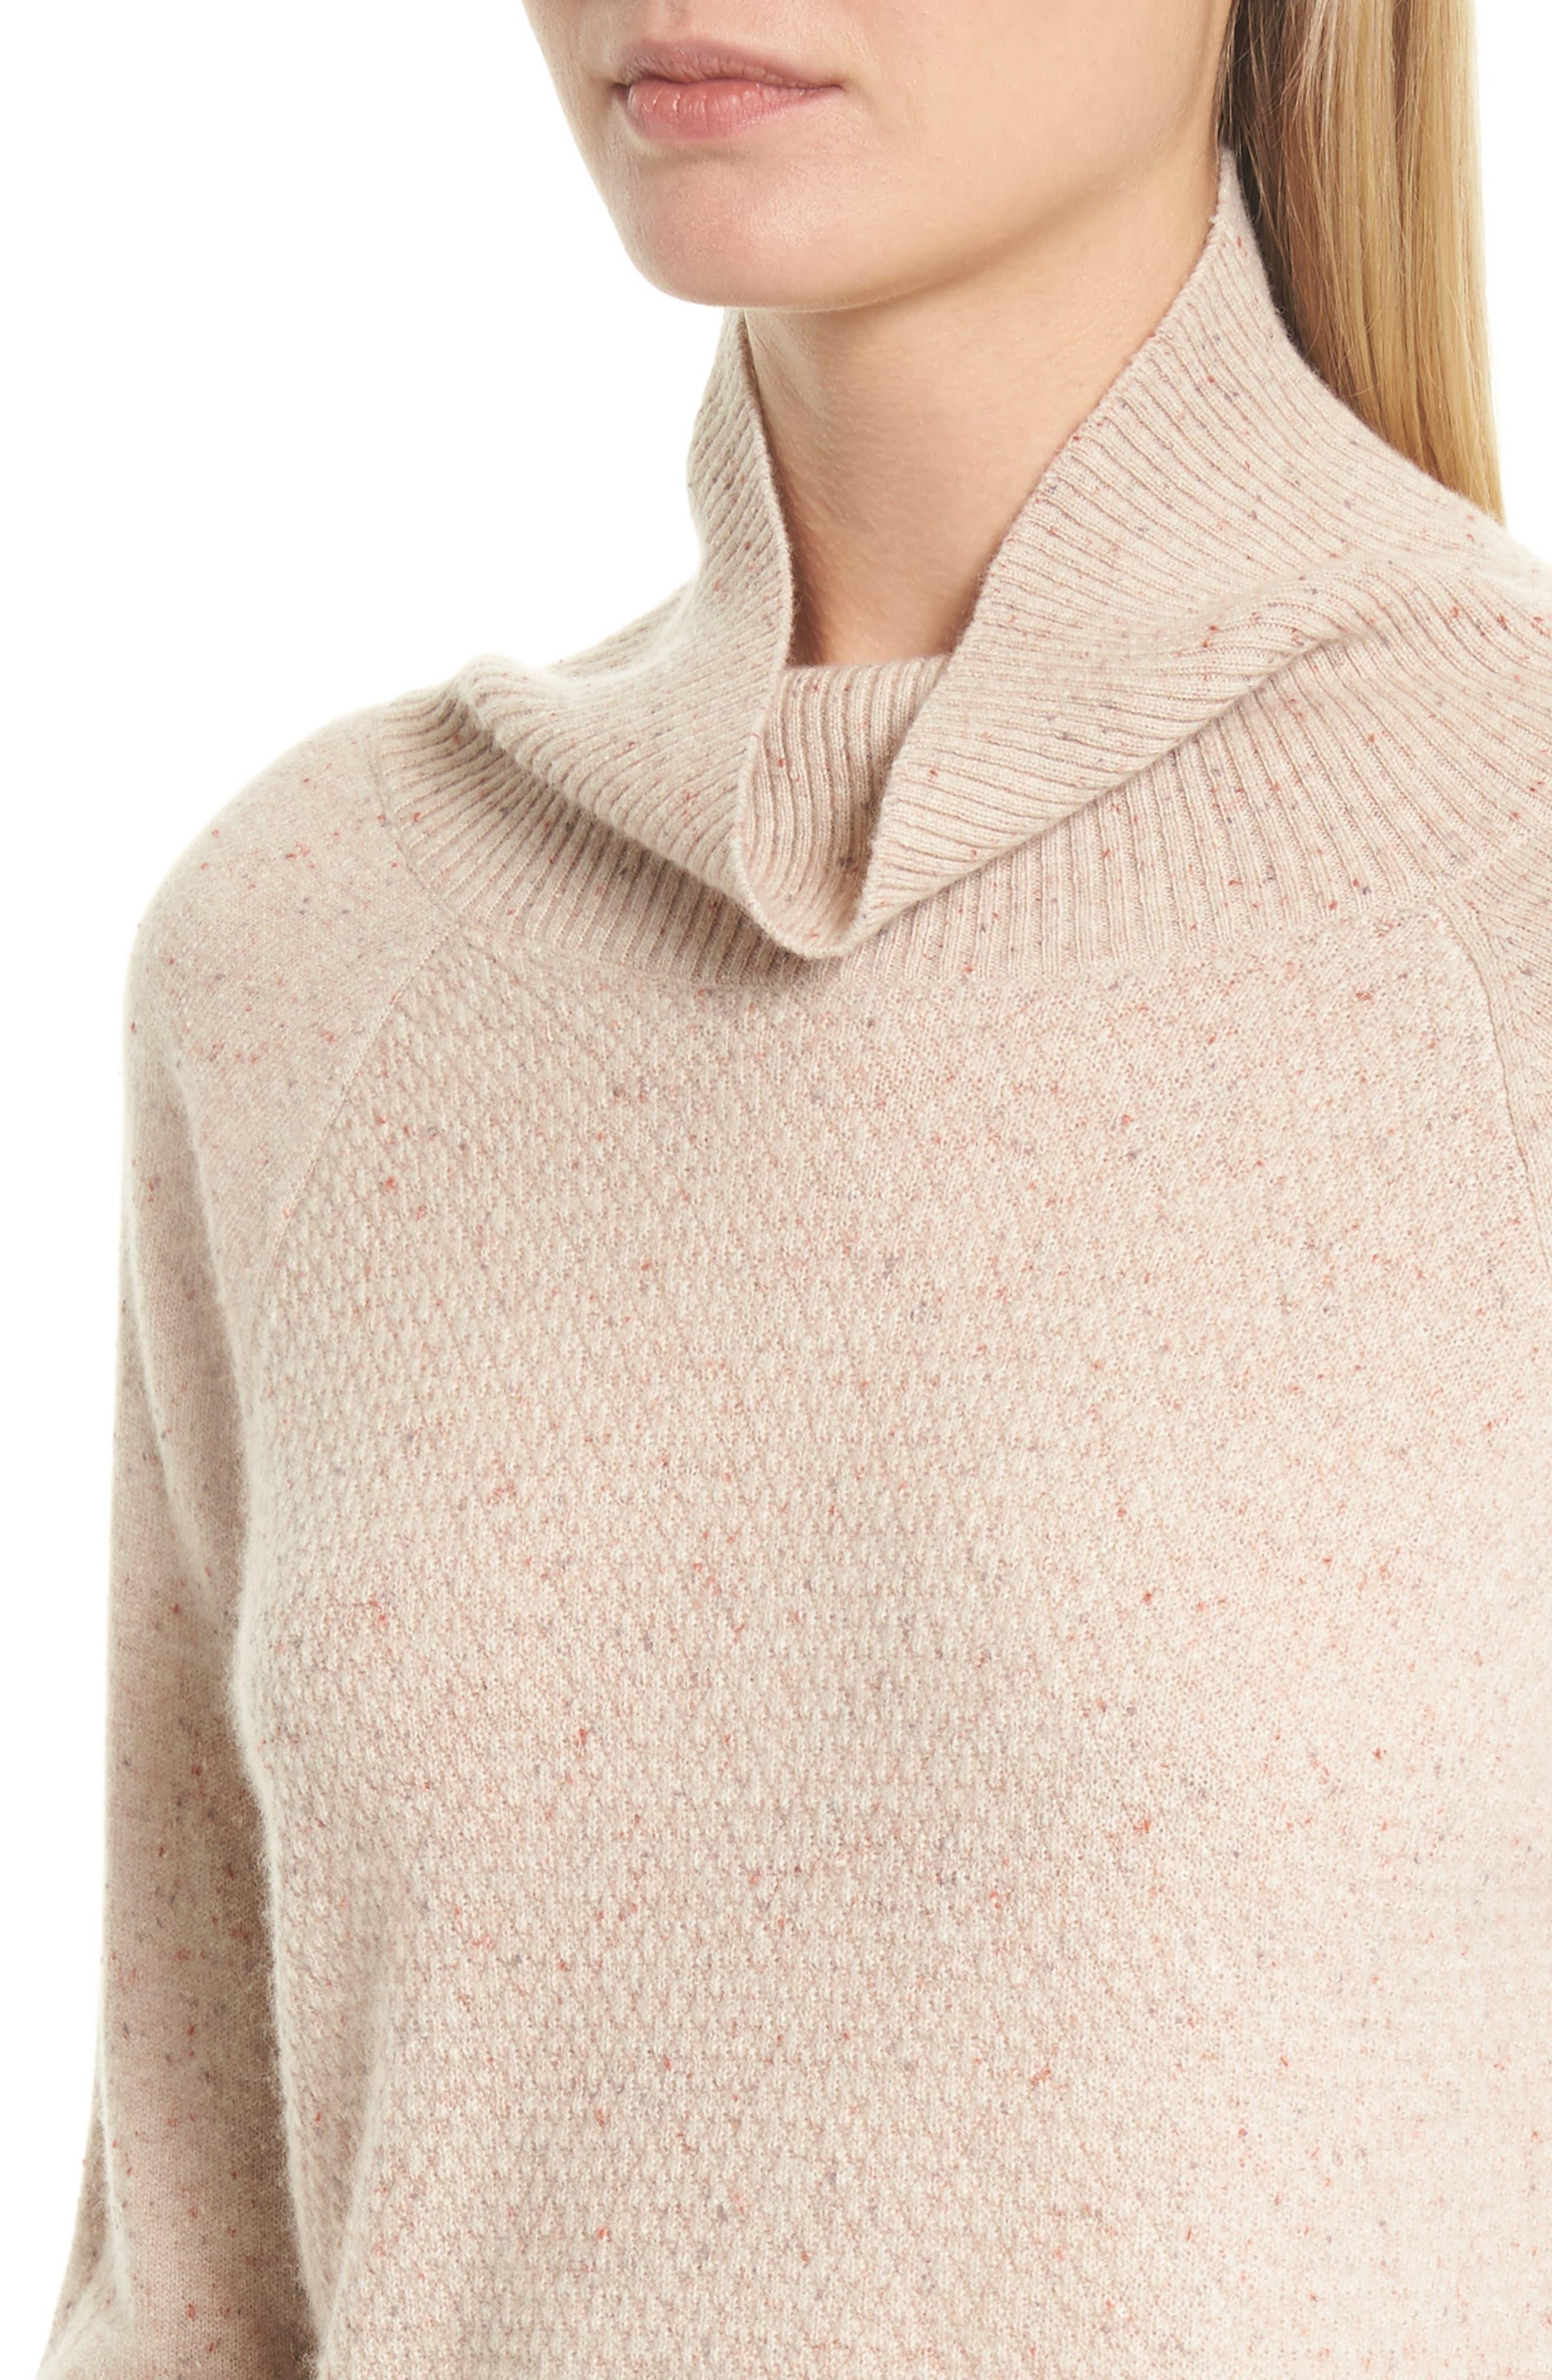 Havin Cashmere Sweater,                             Alternate thumbnail 4, color,                             696